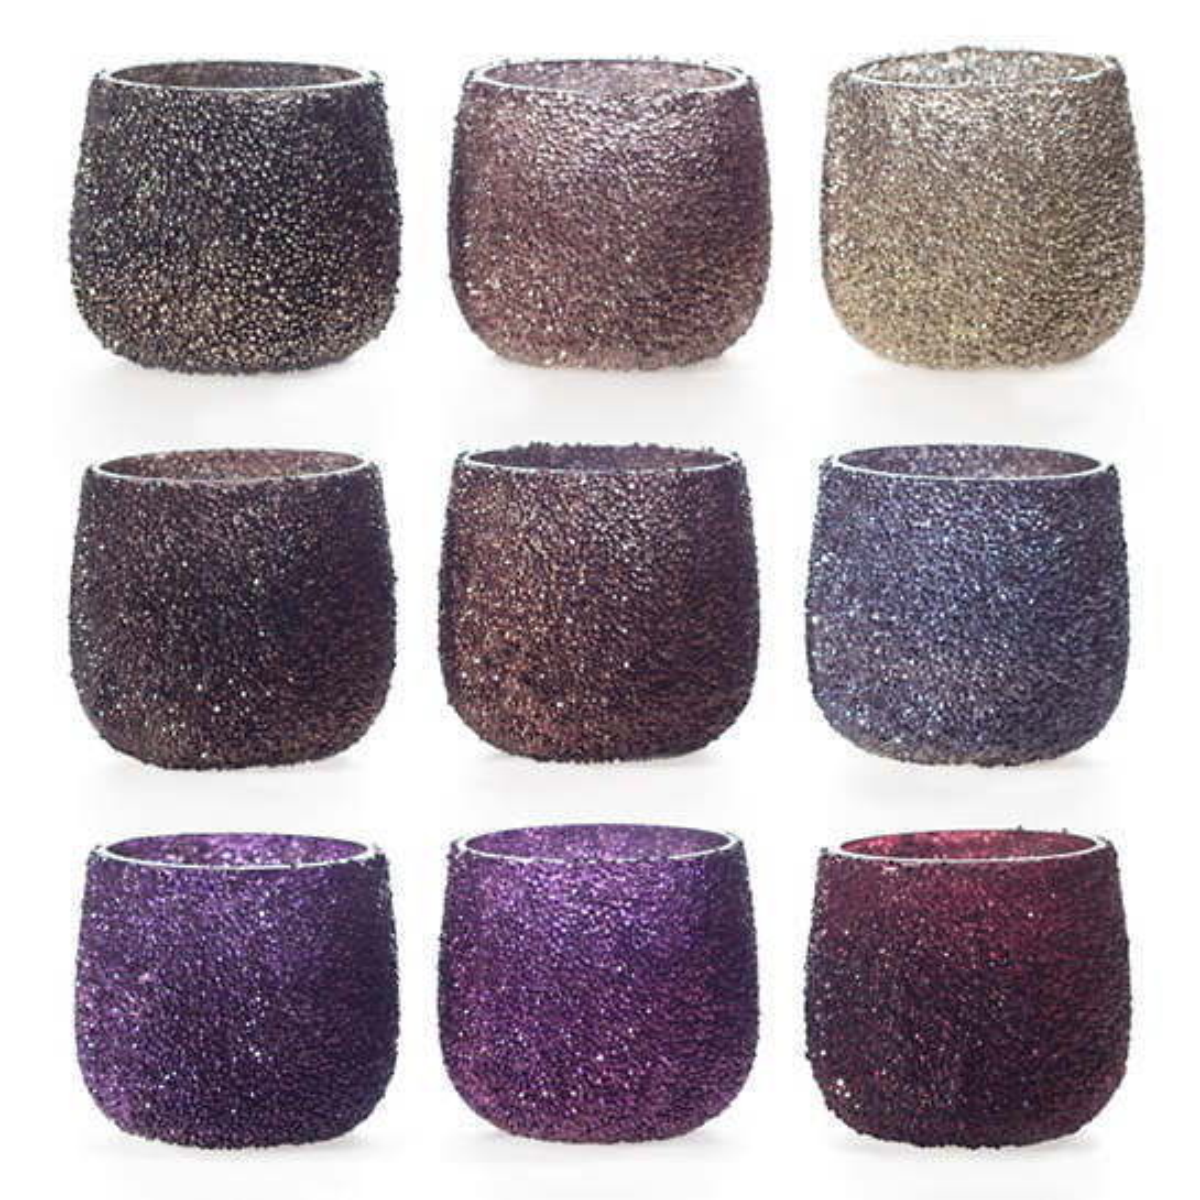 Warm Jewel Tone Sparkle Tealight Holder/Set Of 9